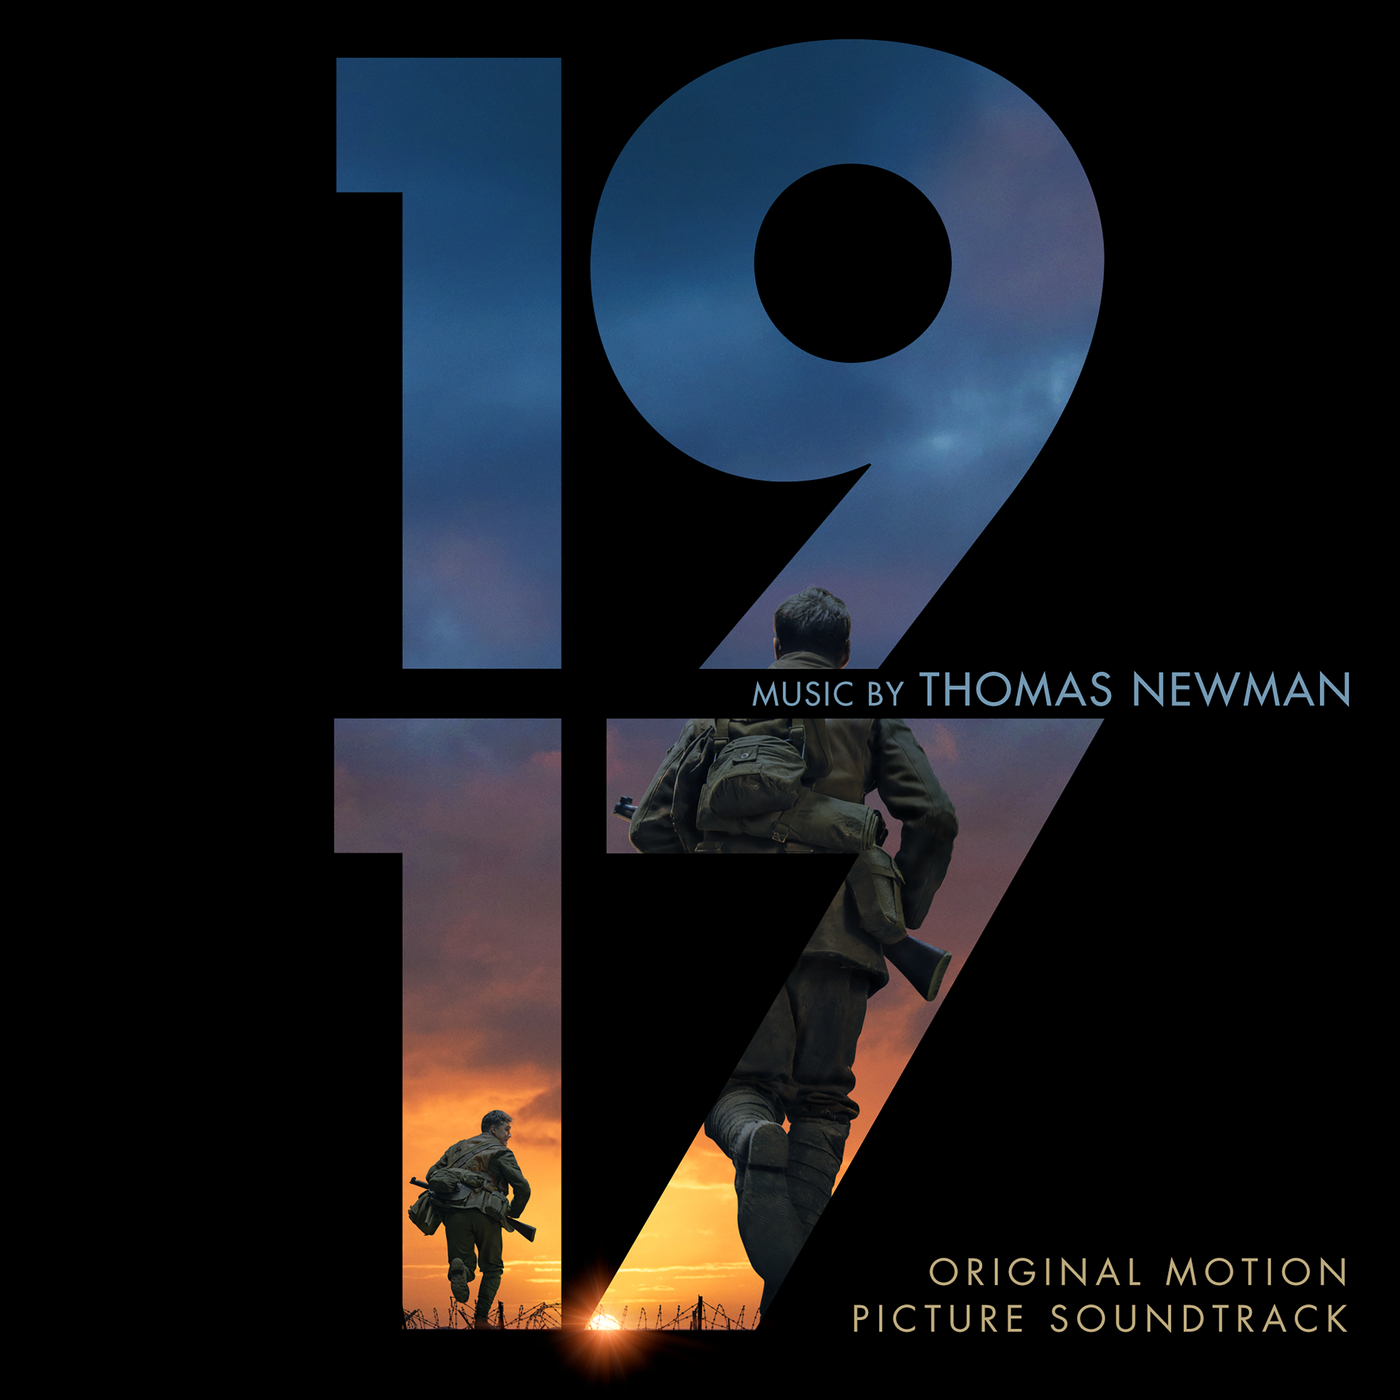 1917 (Original Motion Picture Soundtrack) - Thomas Newman